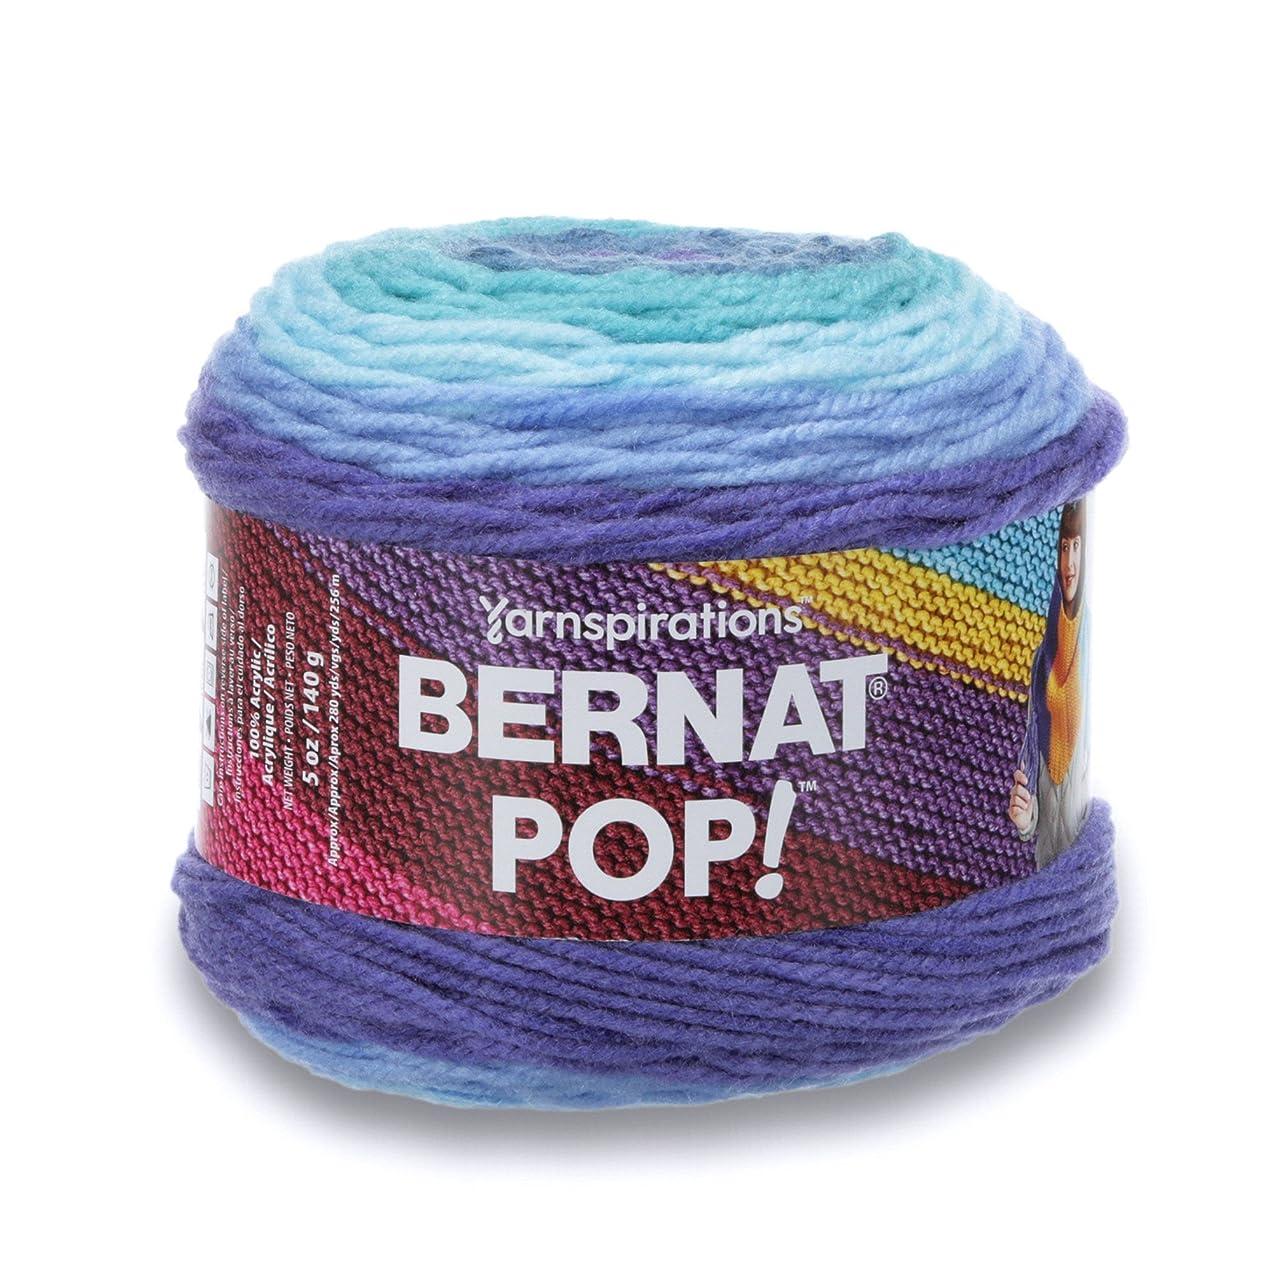 Bernat POP!, 5oz, Guage 4 Medium, 100% Acrylic, Blue Blaze